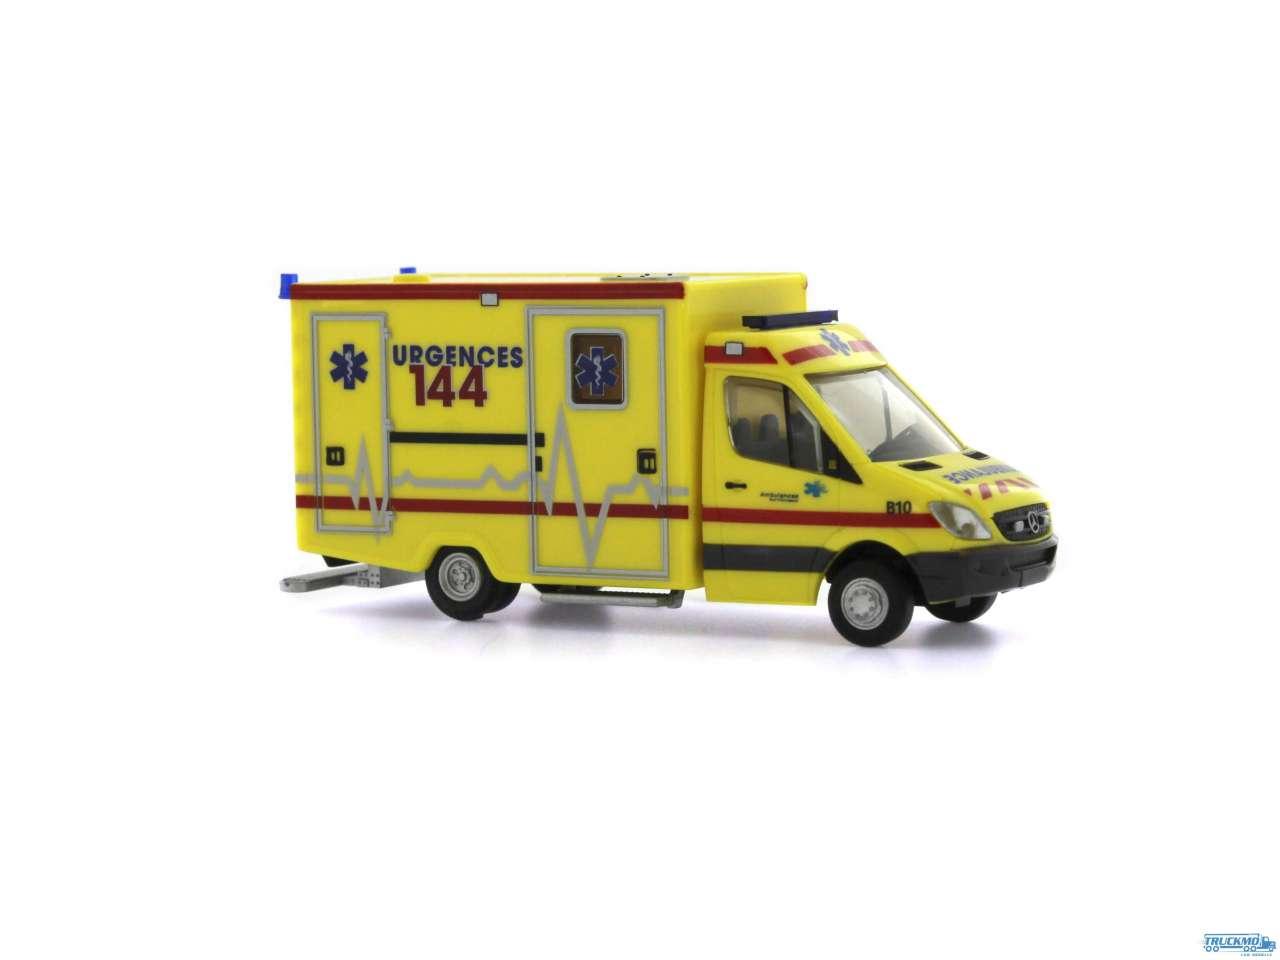 Rietze Ambulanz Sud Fribourgeois Mercedes Benz WAS Ambulanz RTW 61797